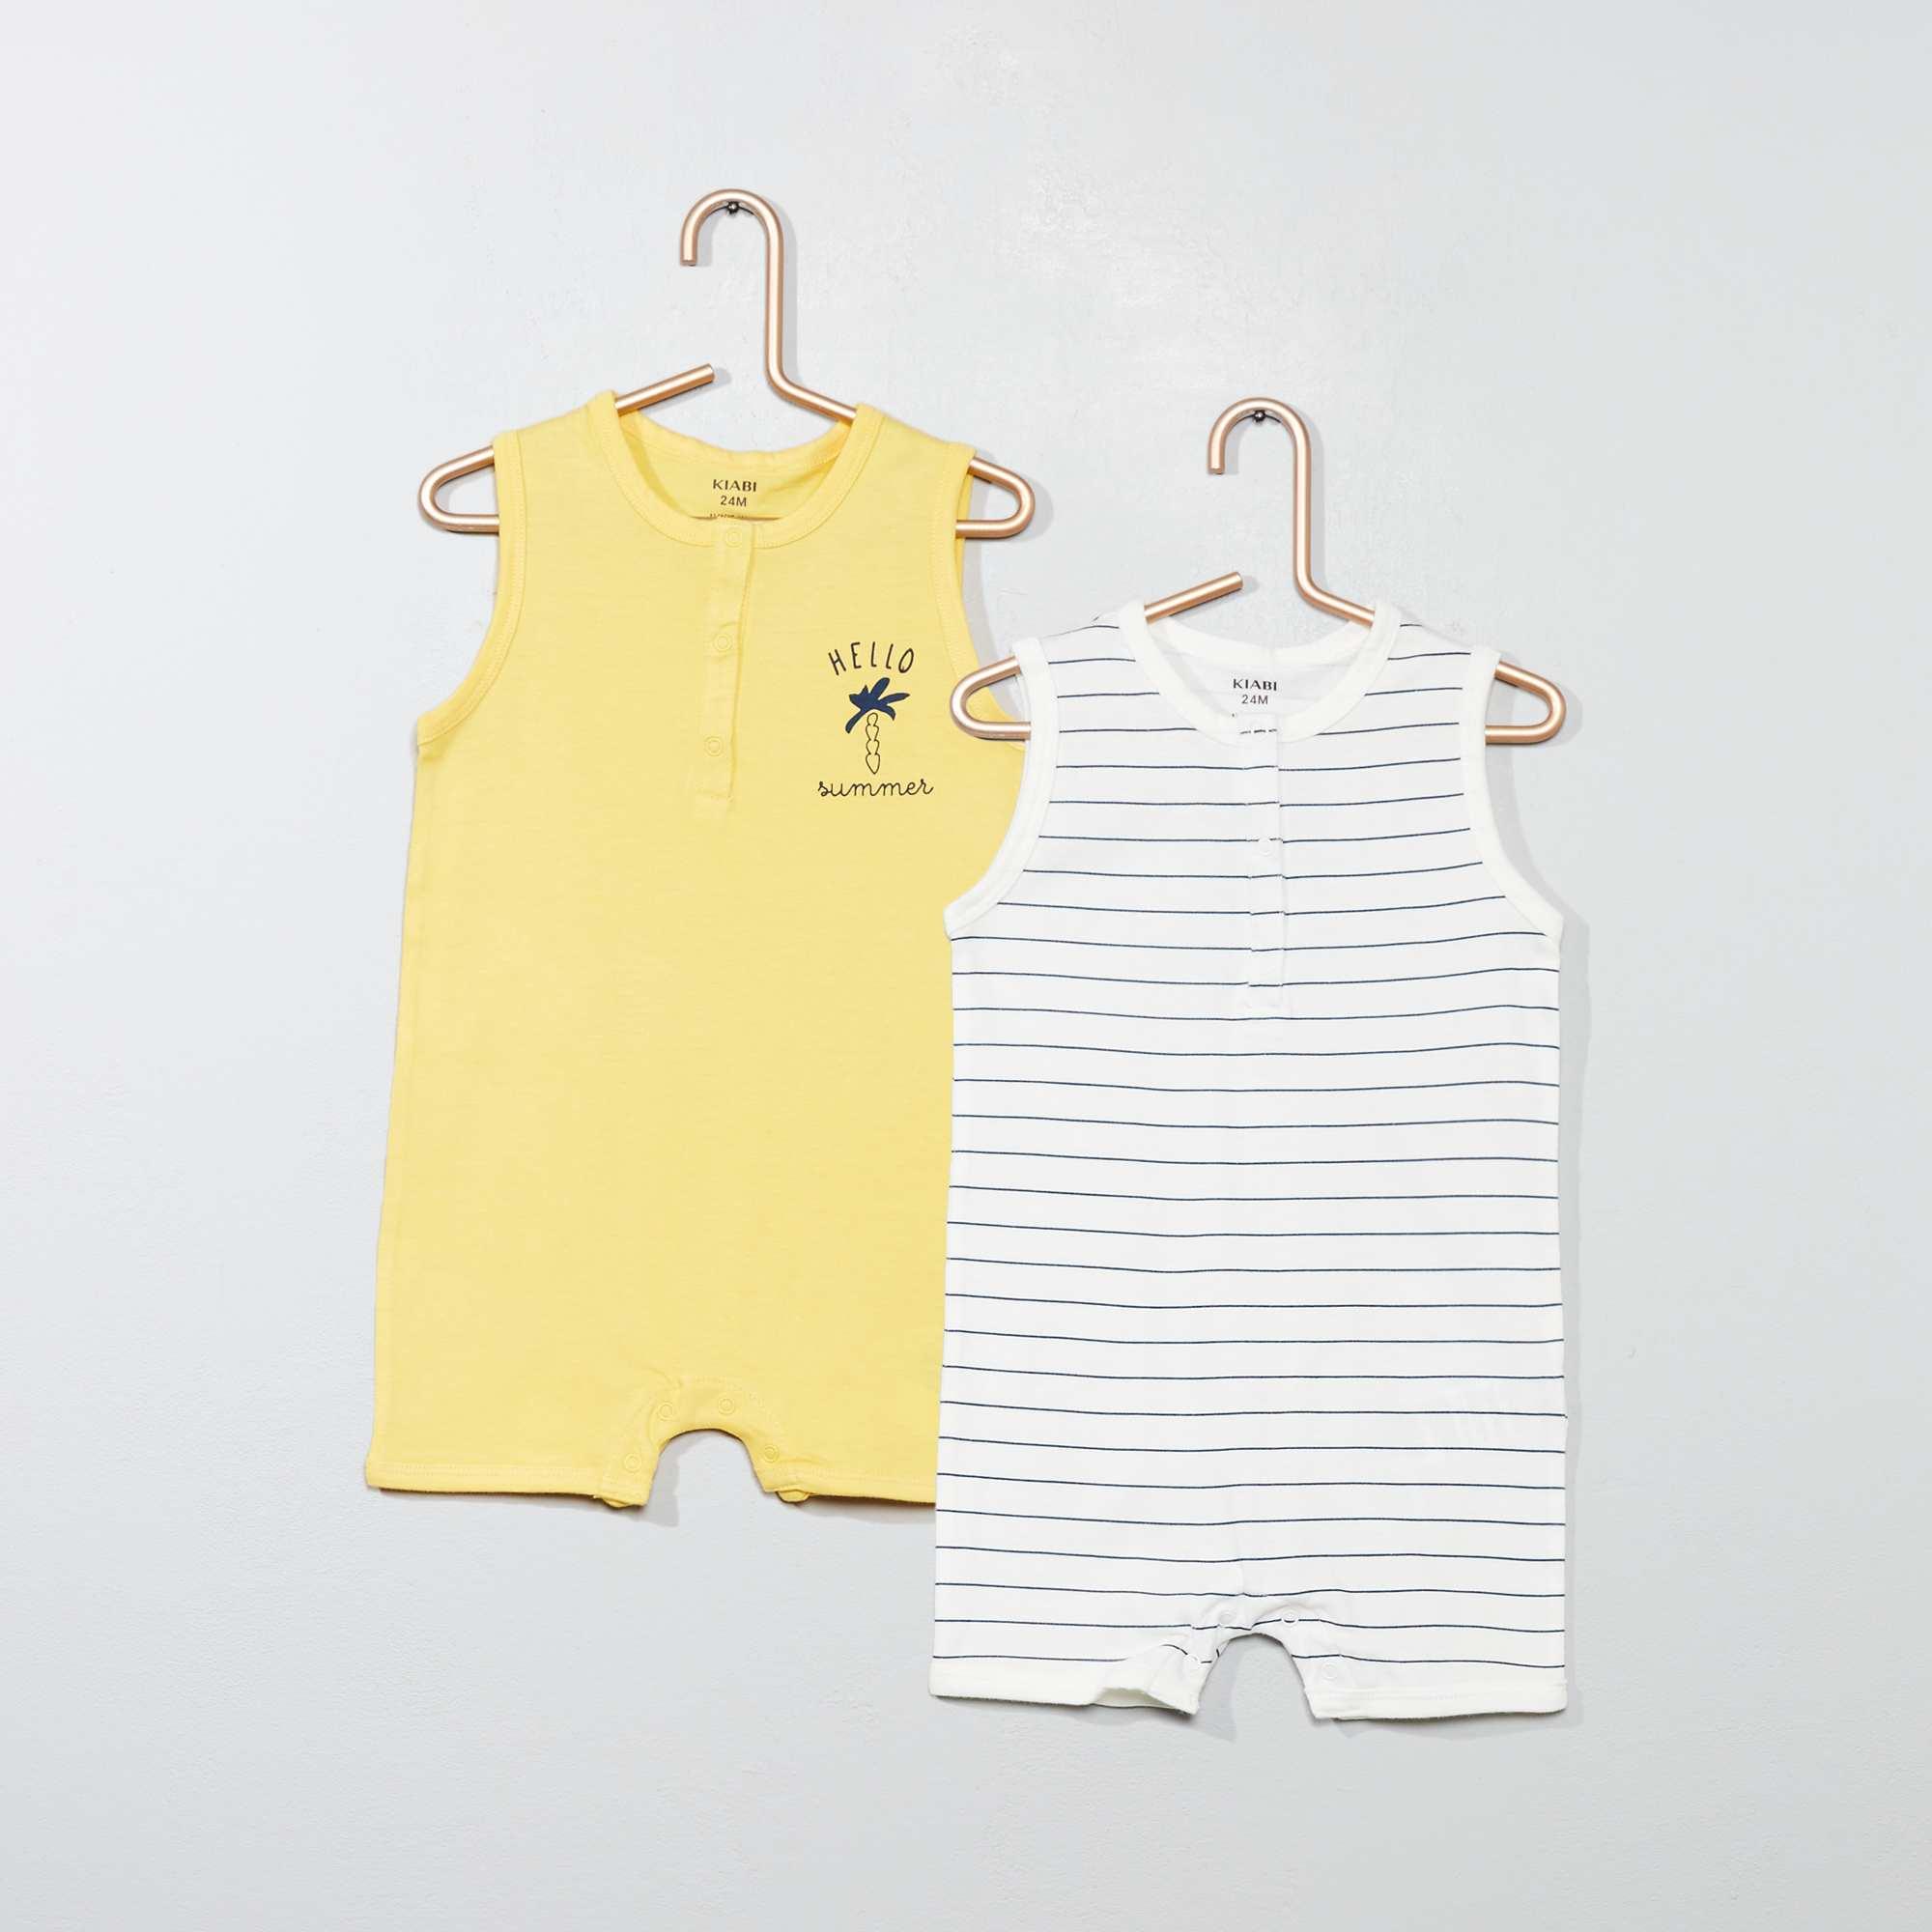 f21b99b3b Pack de 2 peleles estampados Bebé niño - BLANCO - Kiabi - 8